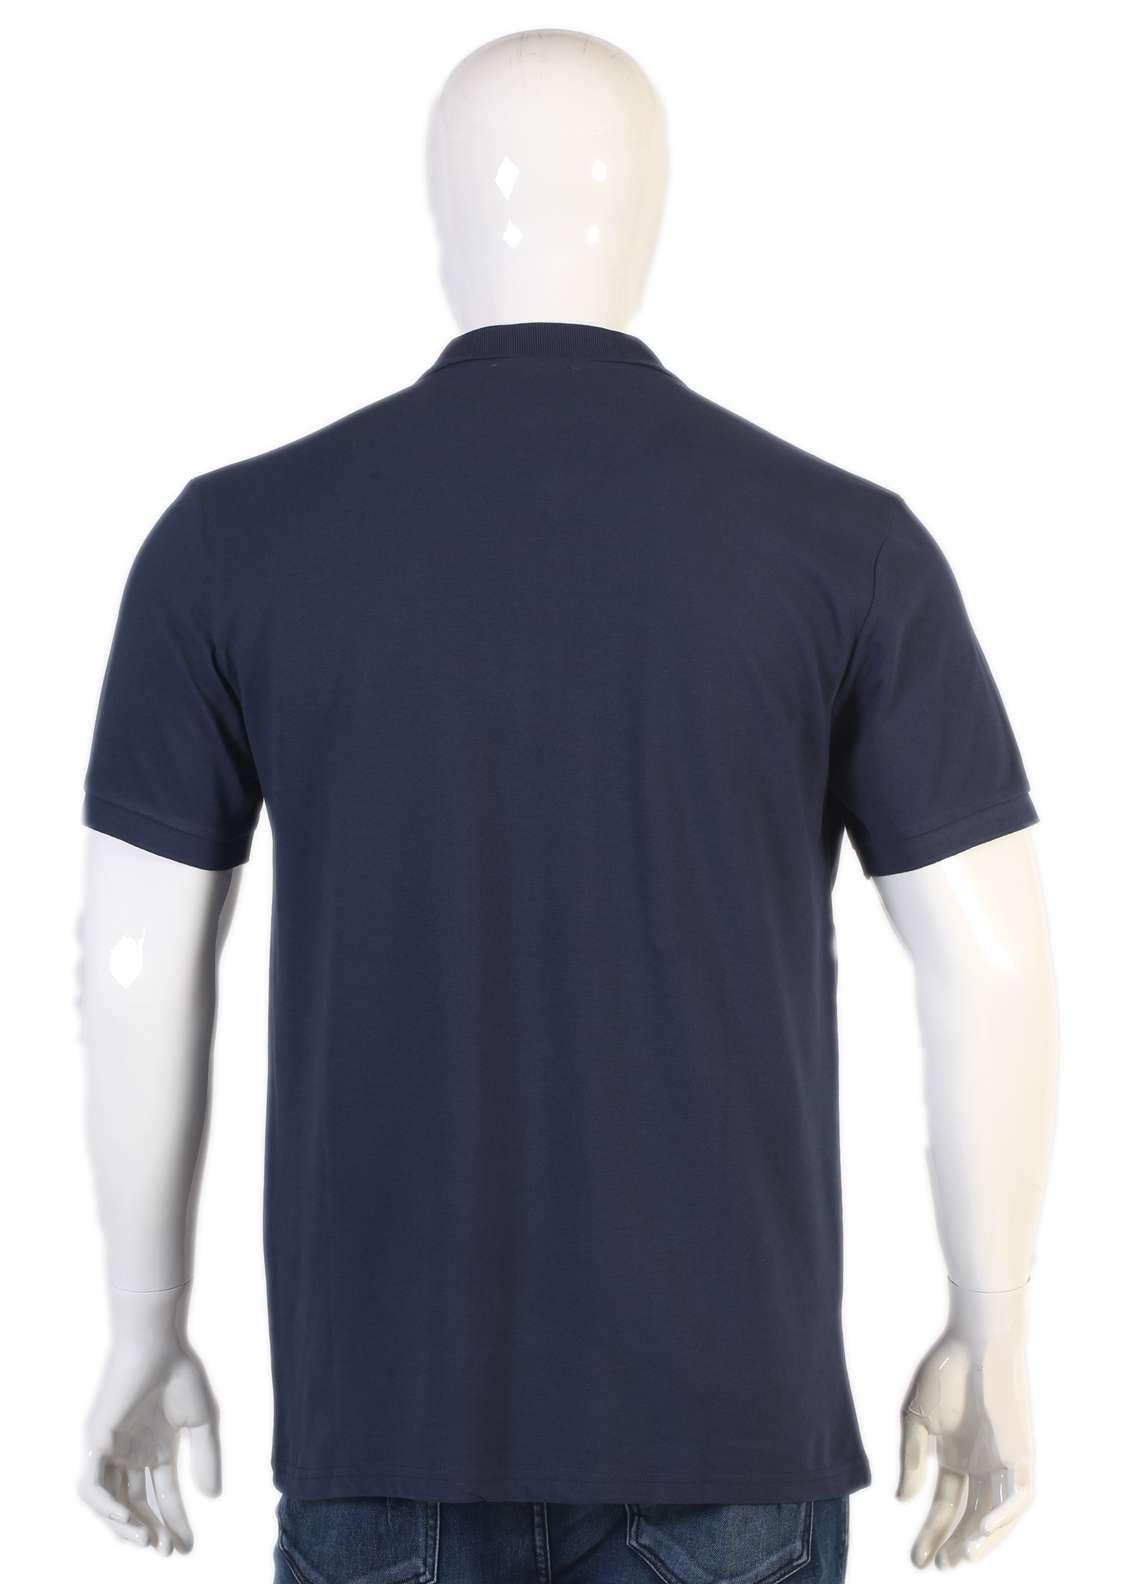 Sanaulla Exclusive Range Jersey Polo Men T-Shirts - Navy Blue TKM18S V-8